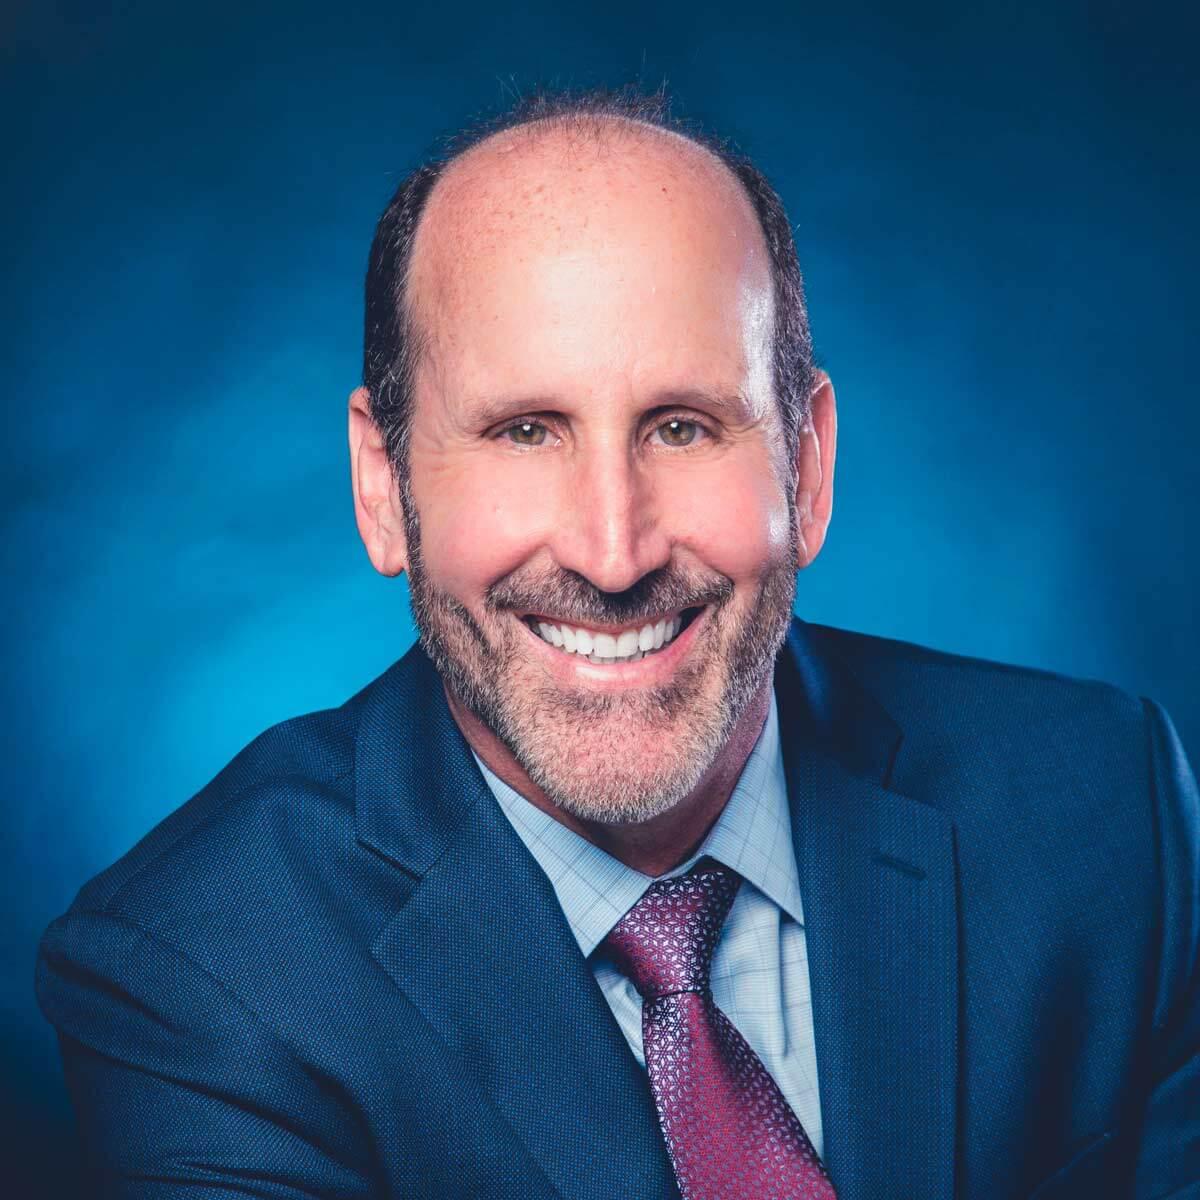 Meet Steve Barrett, DDS, Brasseler Dental Appreciation Month